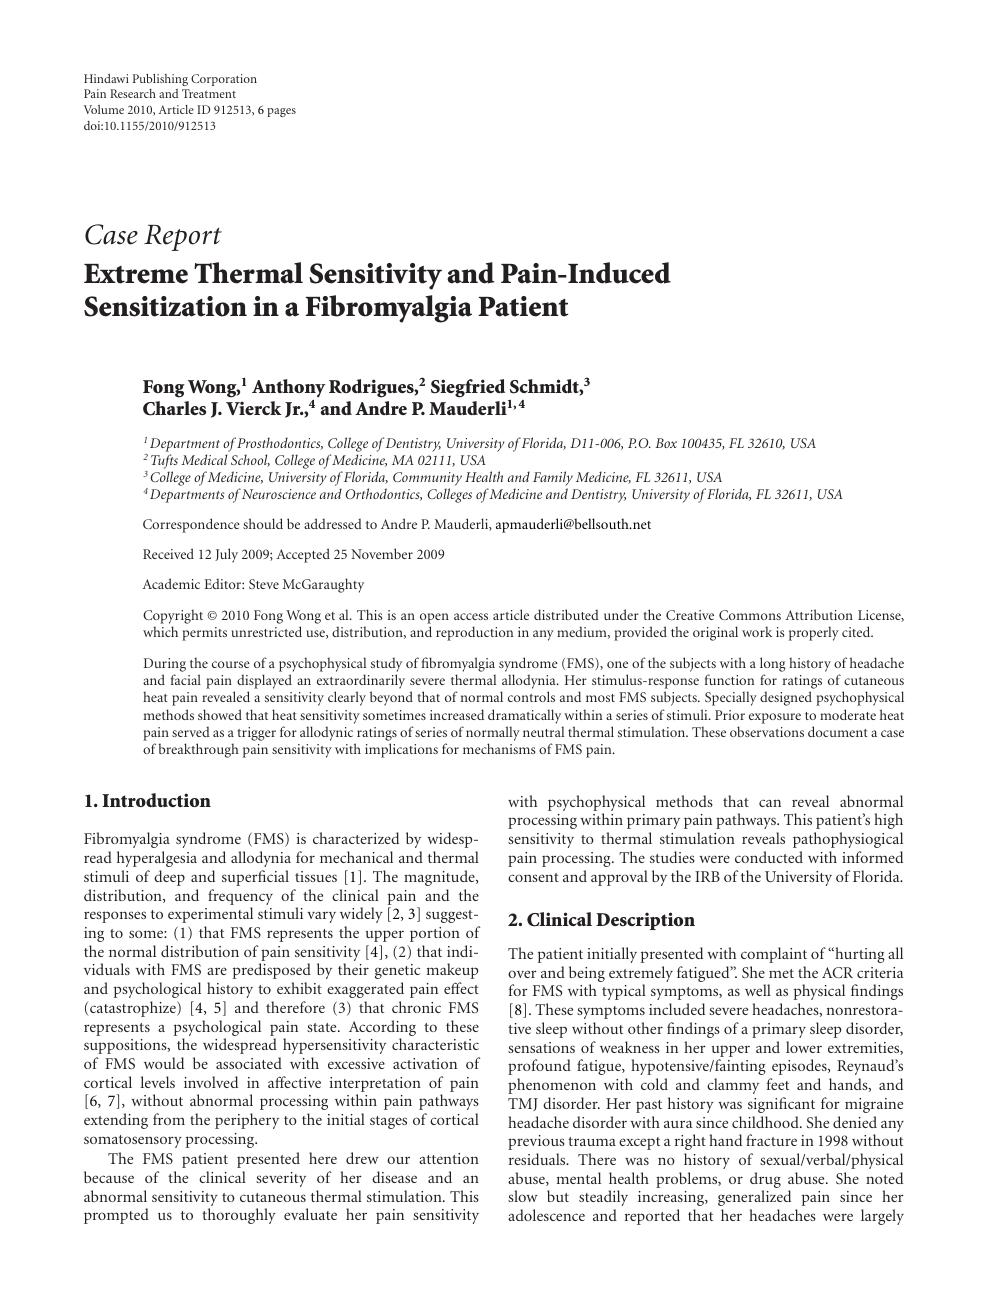 Extreme Thermal Sensitivity and Pain-Induced Sensitization